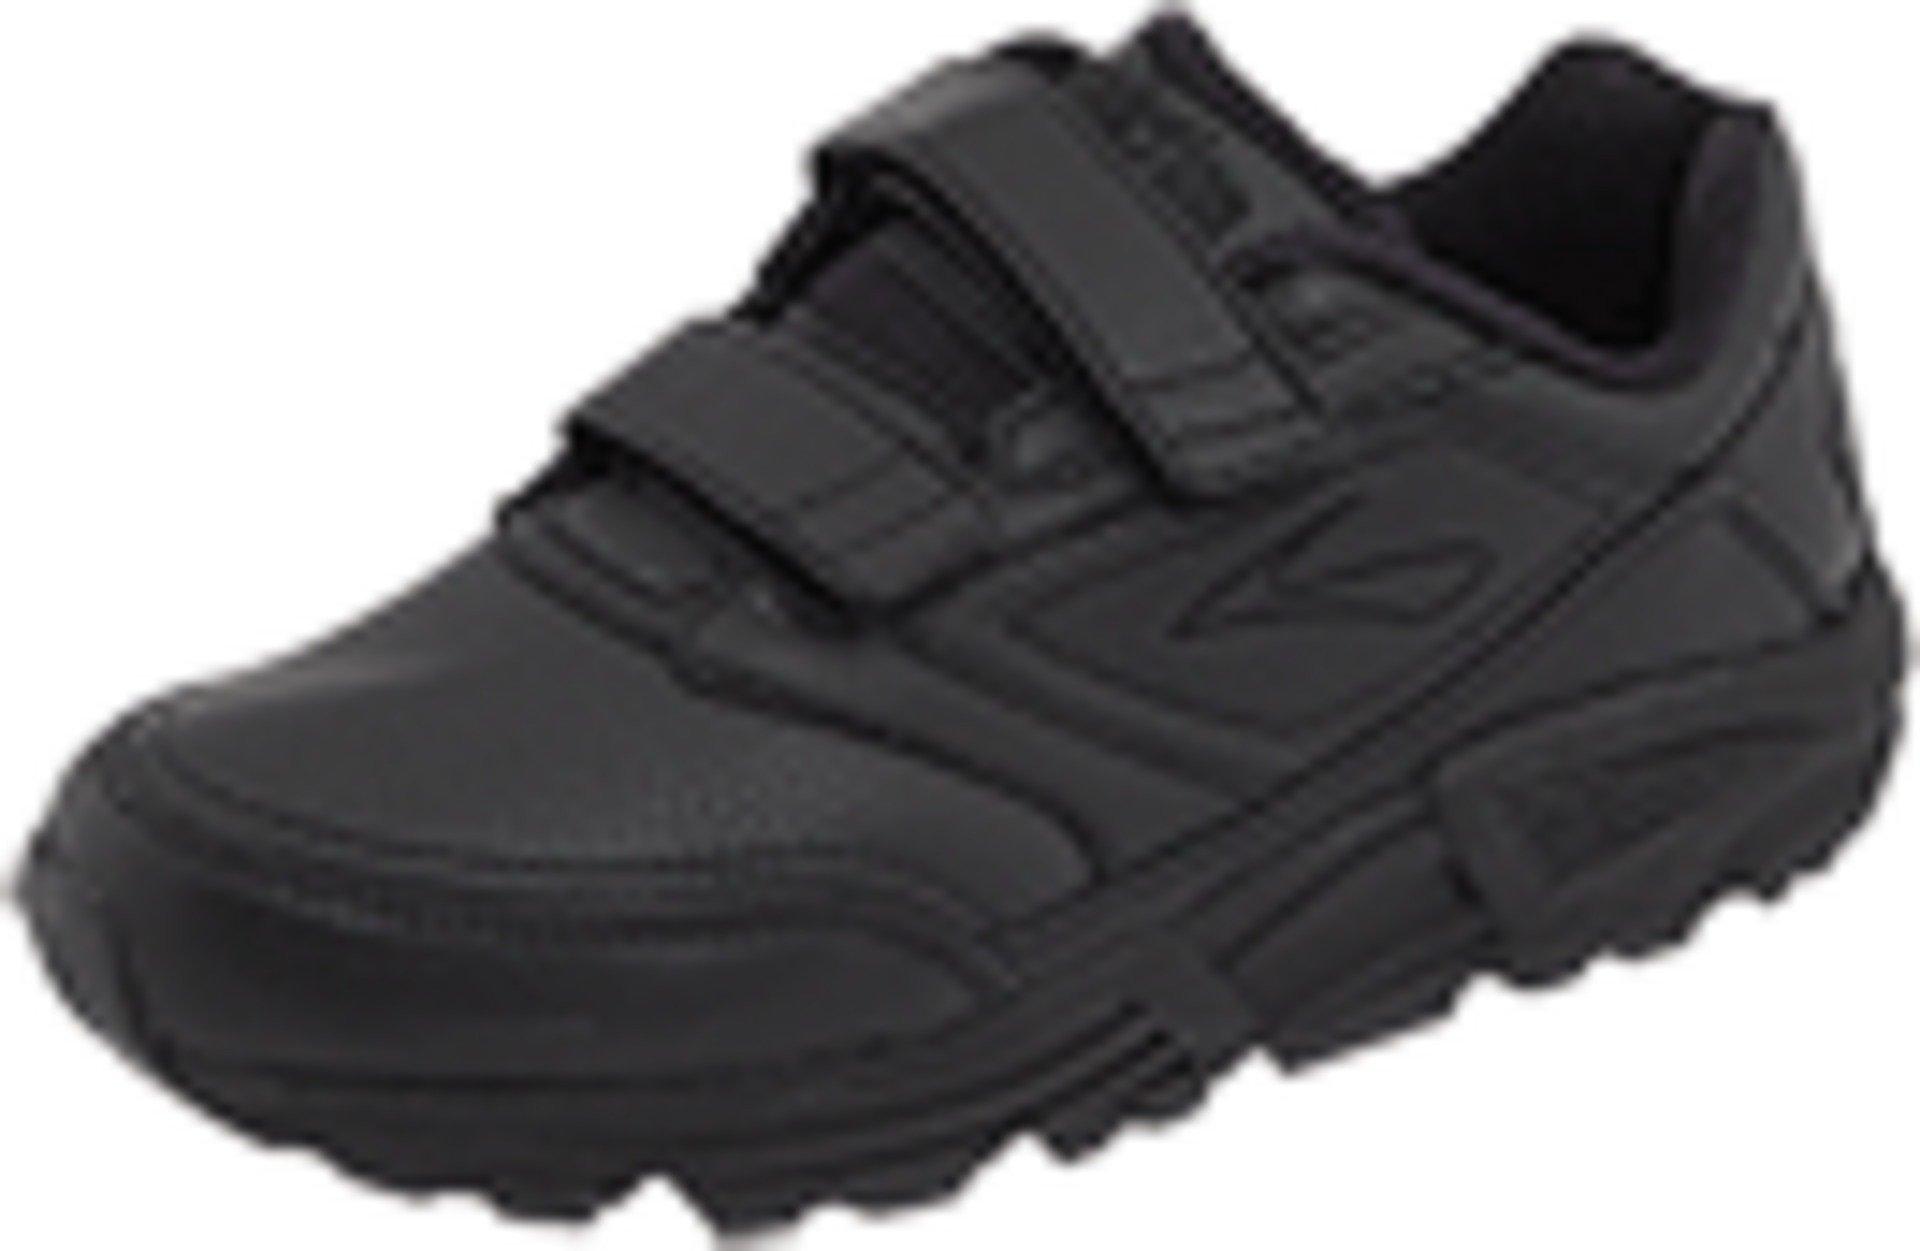 Brooks Women's Addiction Walker V-Strap Walking Shoe,Black,7.5 B